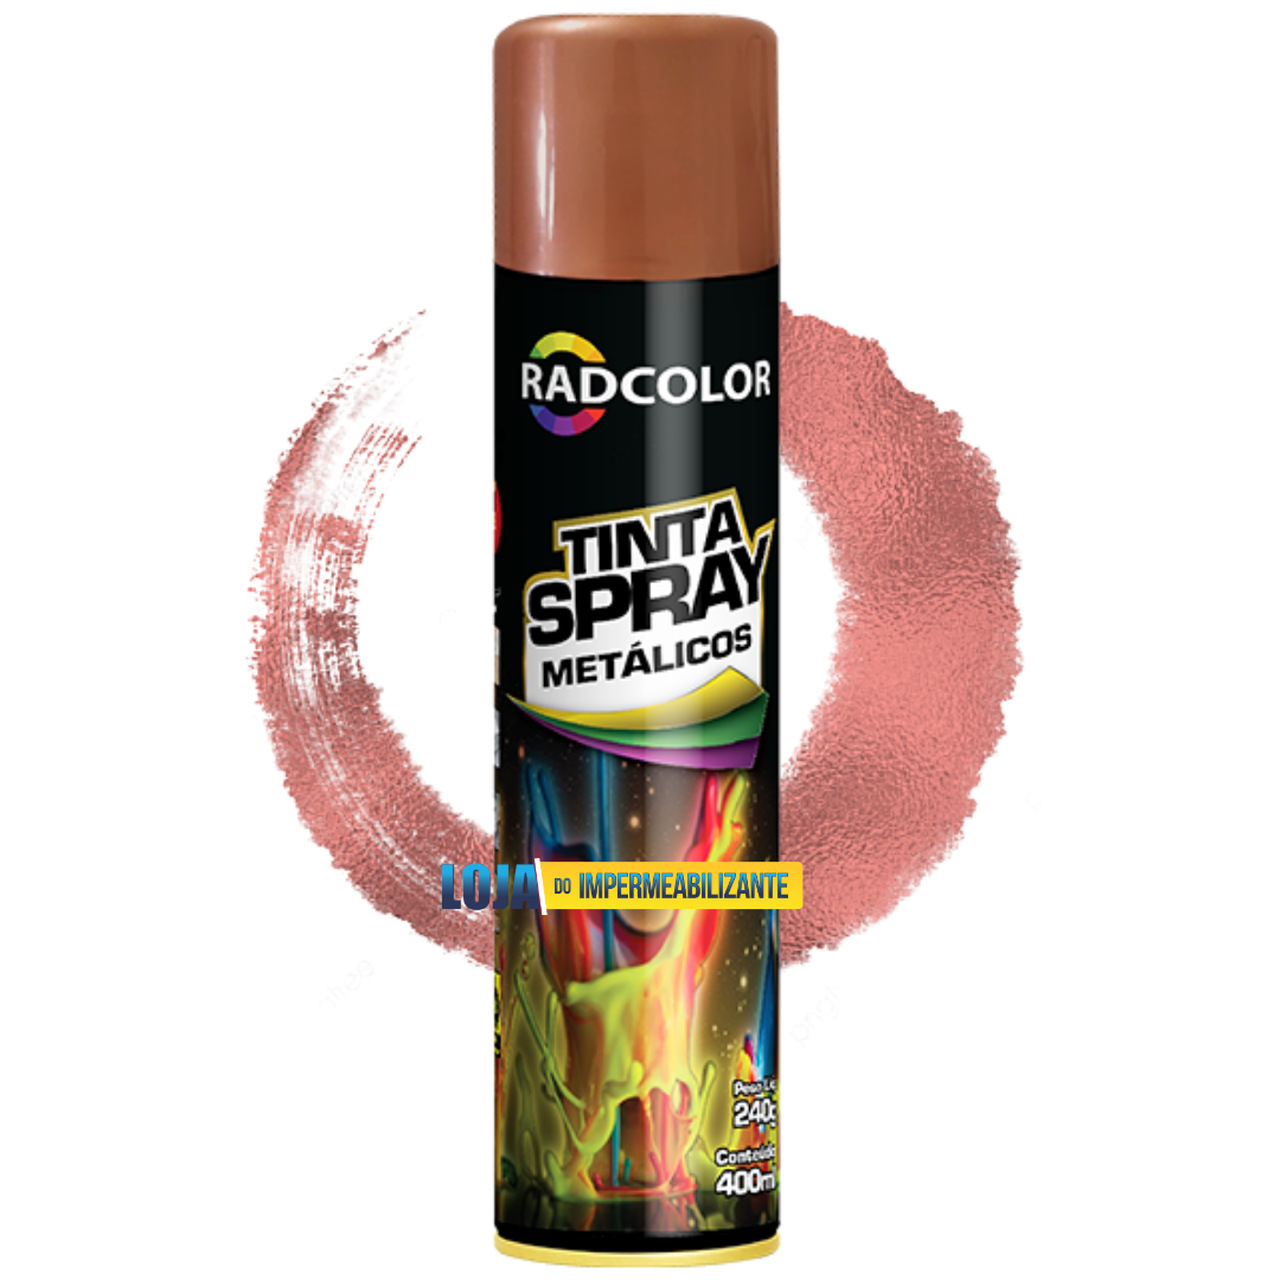 Tinta Spray Rose Gold Esmalte 400ml P/ Pintura De Madeiras, Janelas E Móveis